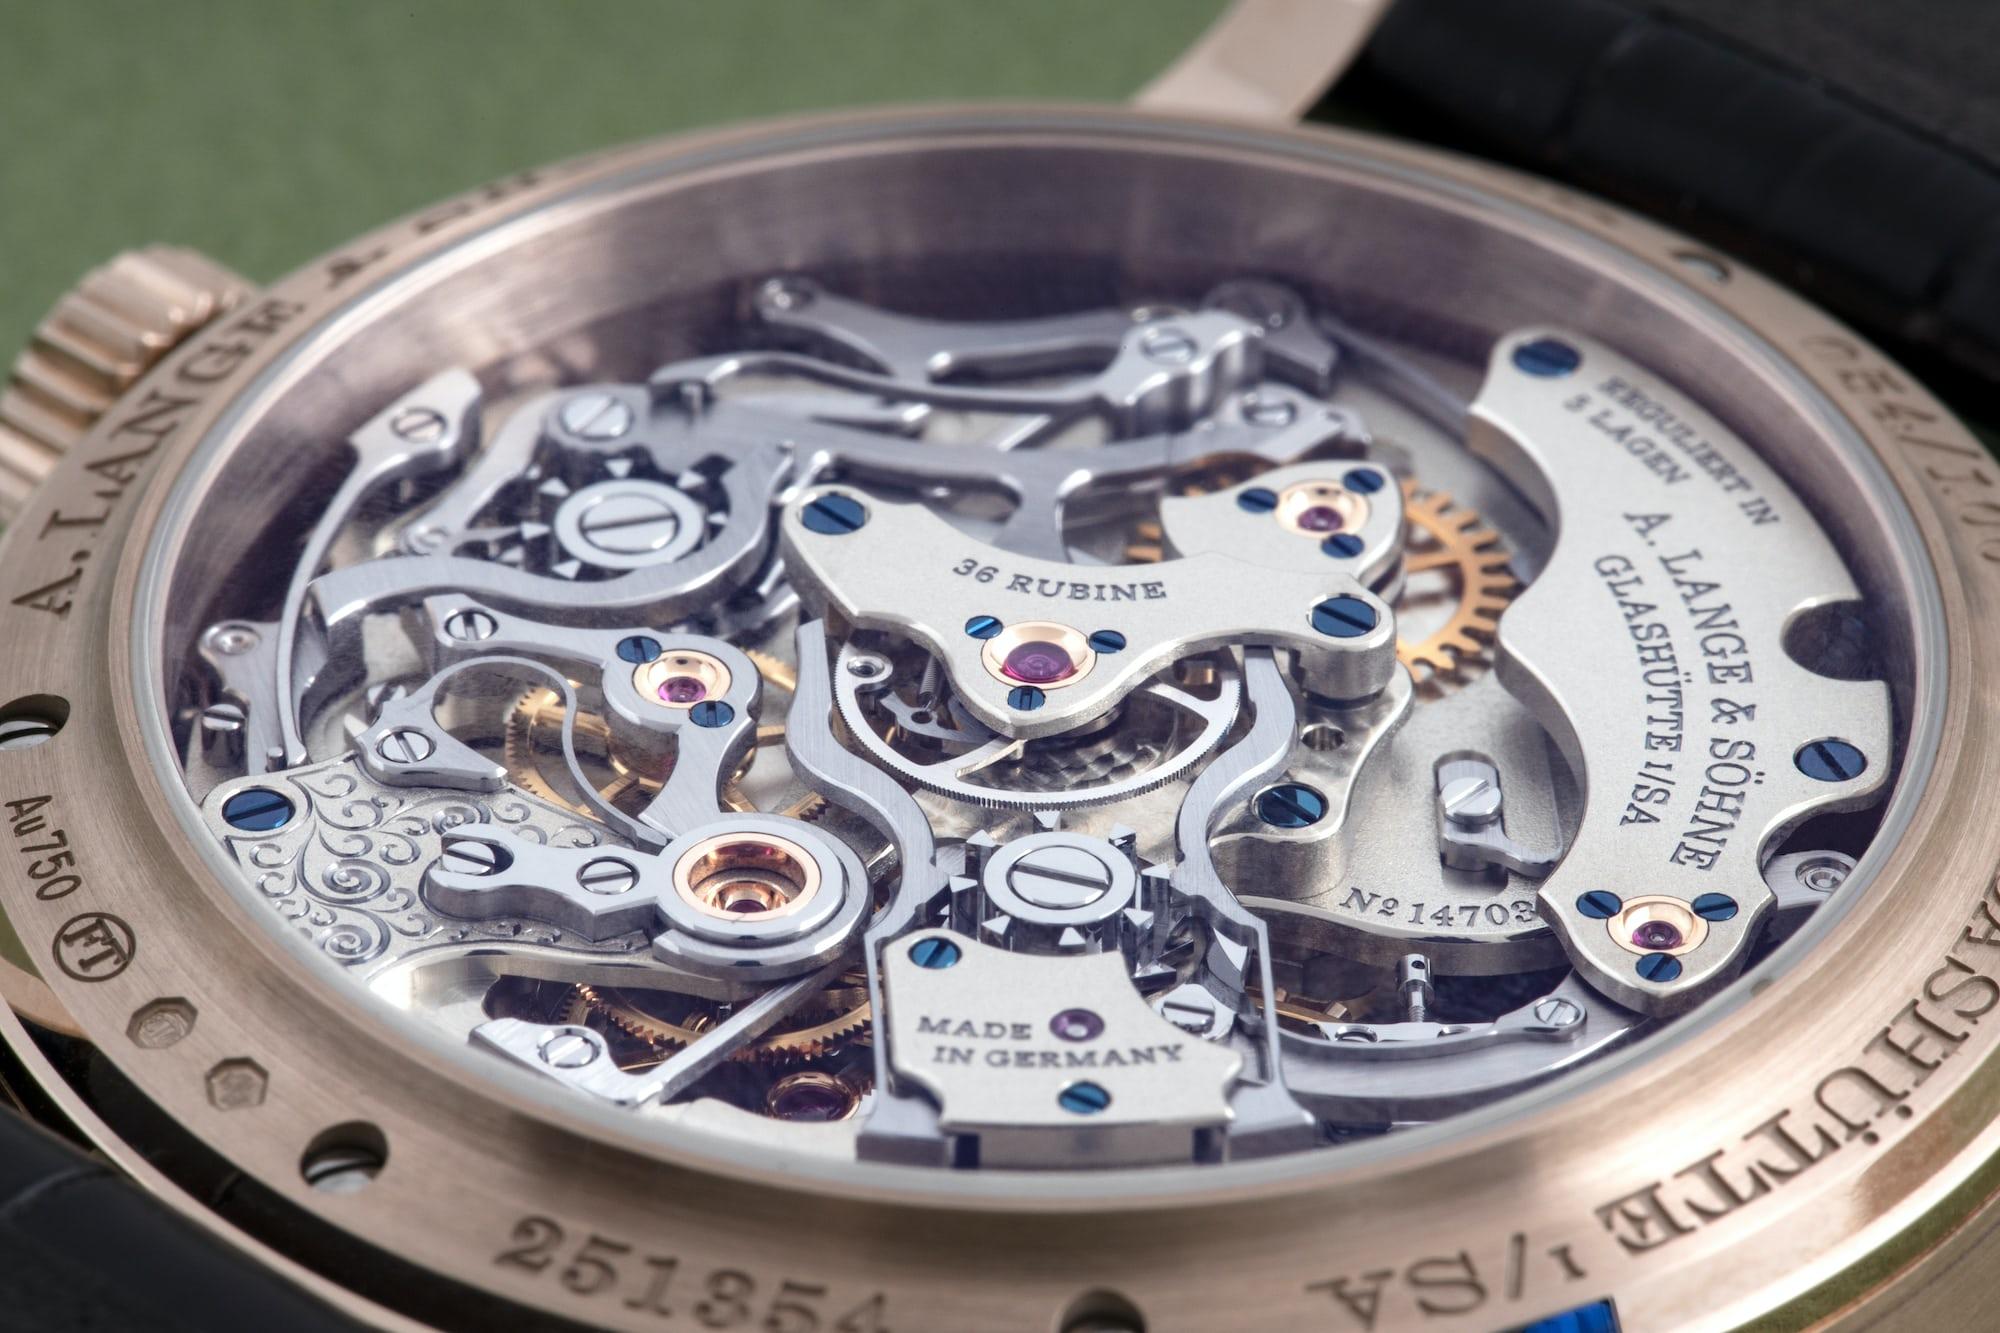 It's Complicated: Inside An A. Lange & Söhne Split-Seconds Chronograph